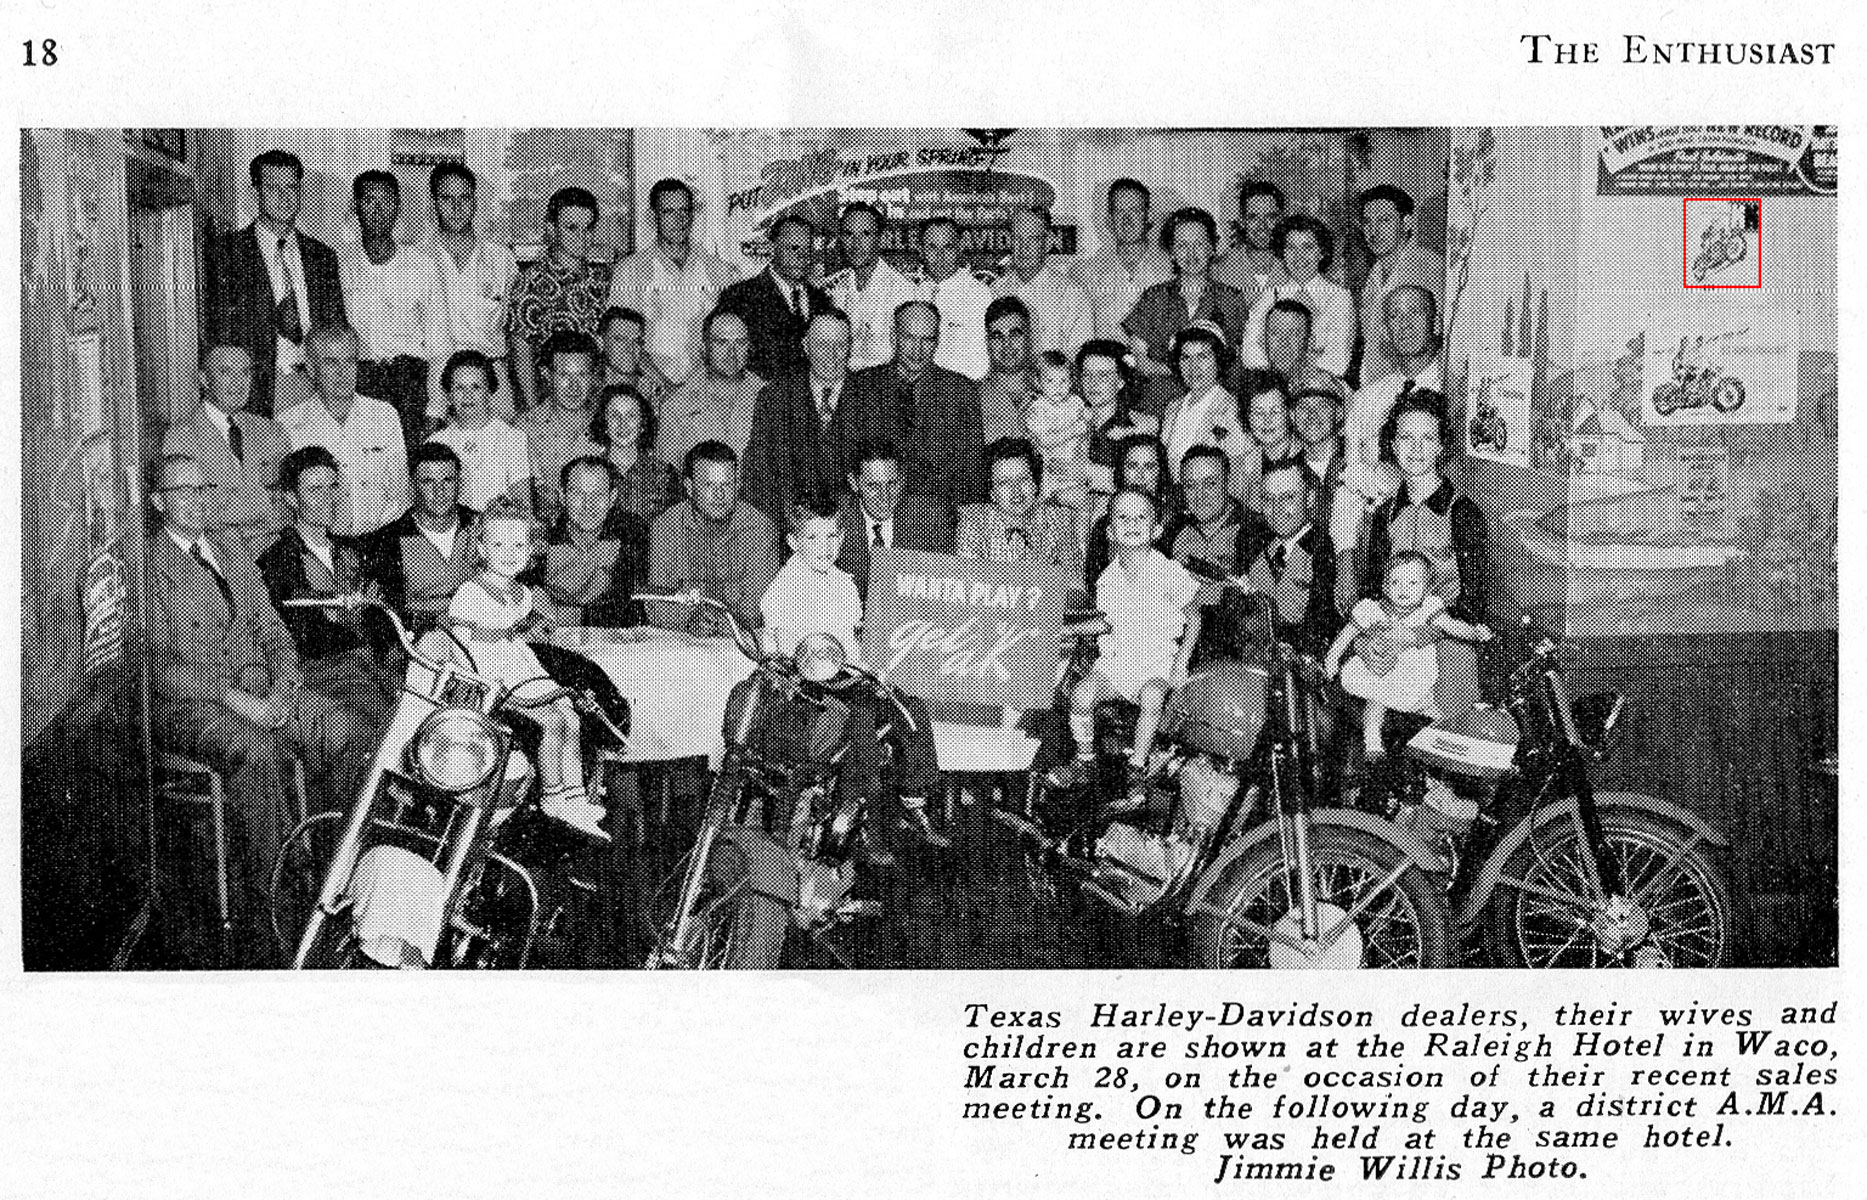 Convención de Distribuidores de Texas - marzo de 1953